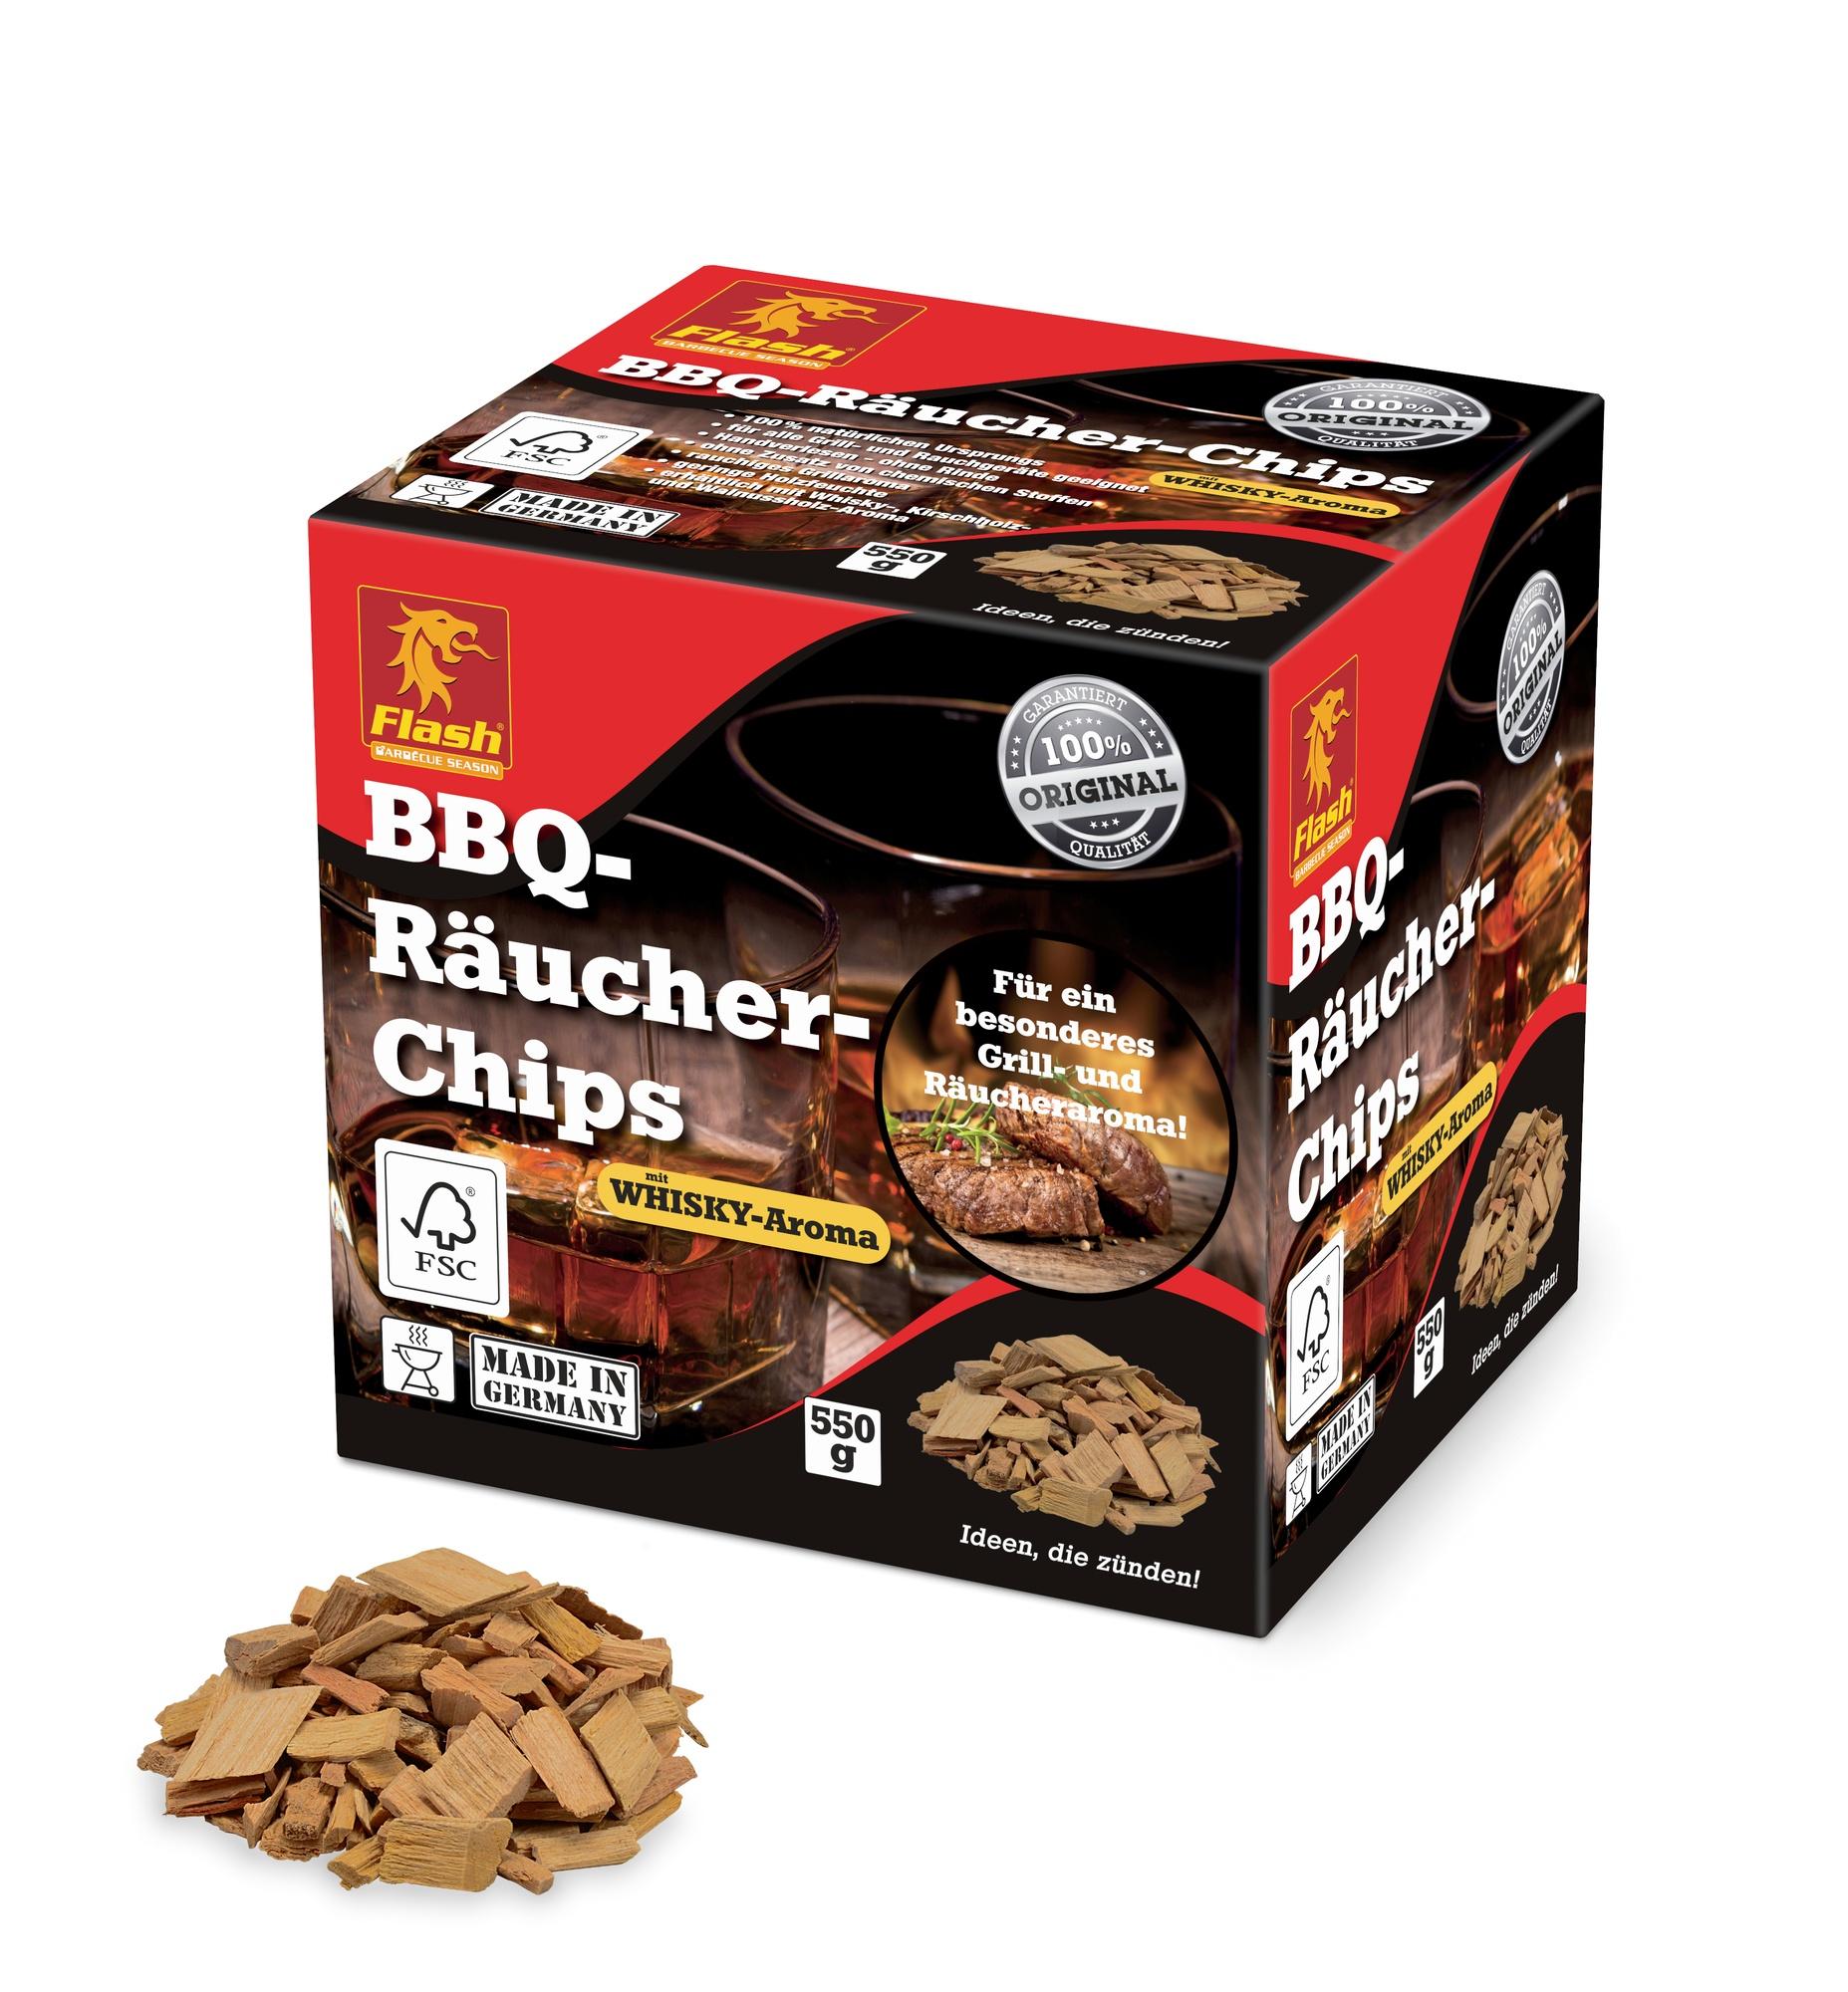 FLASH BBQ Räucher-Chips Whisky 550g